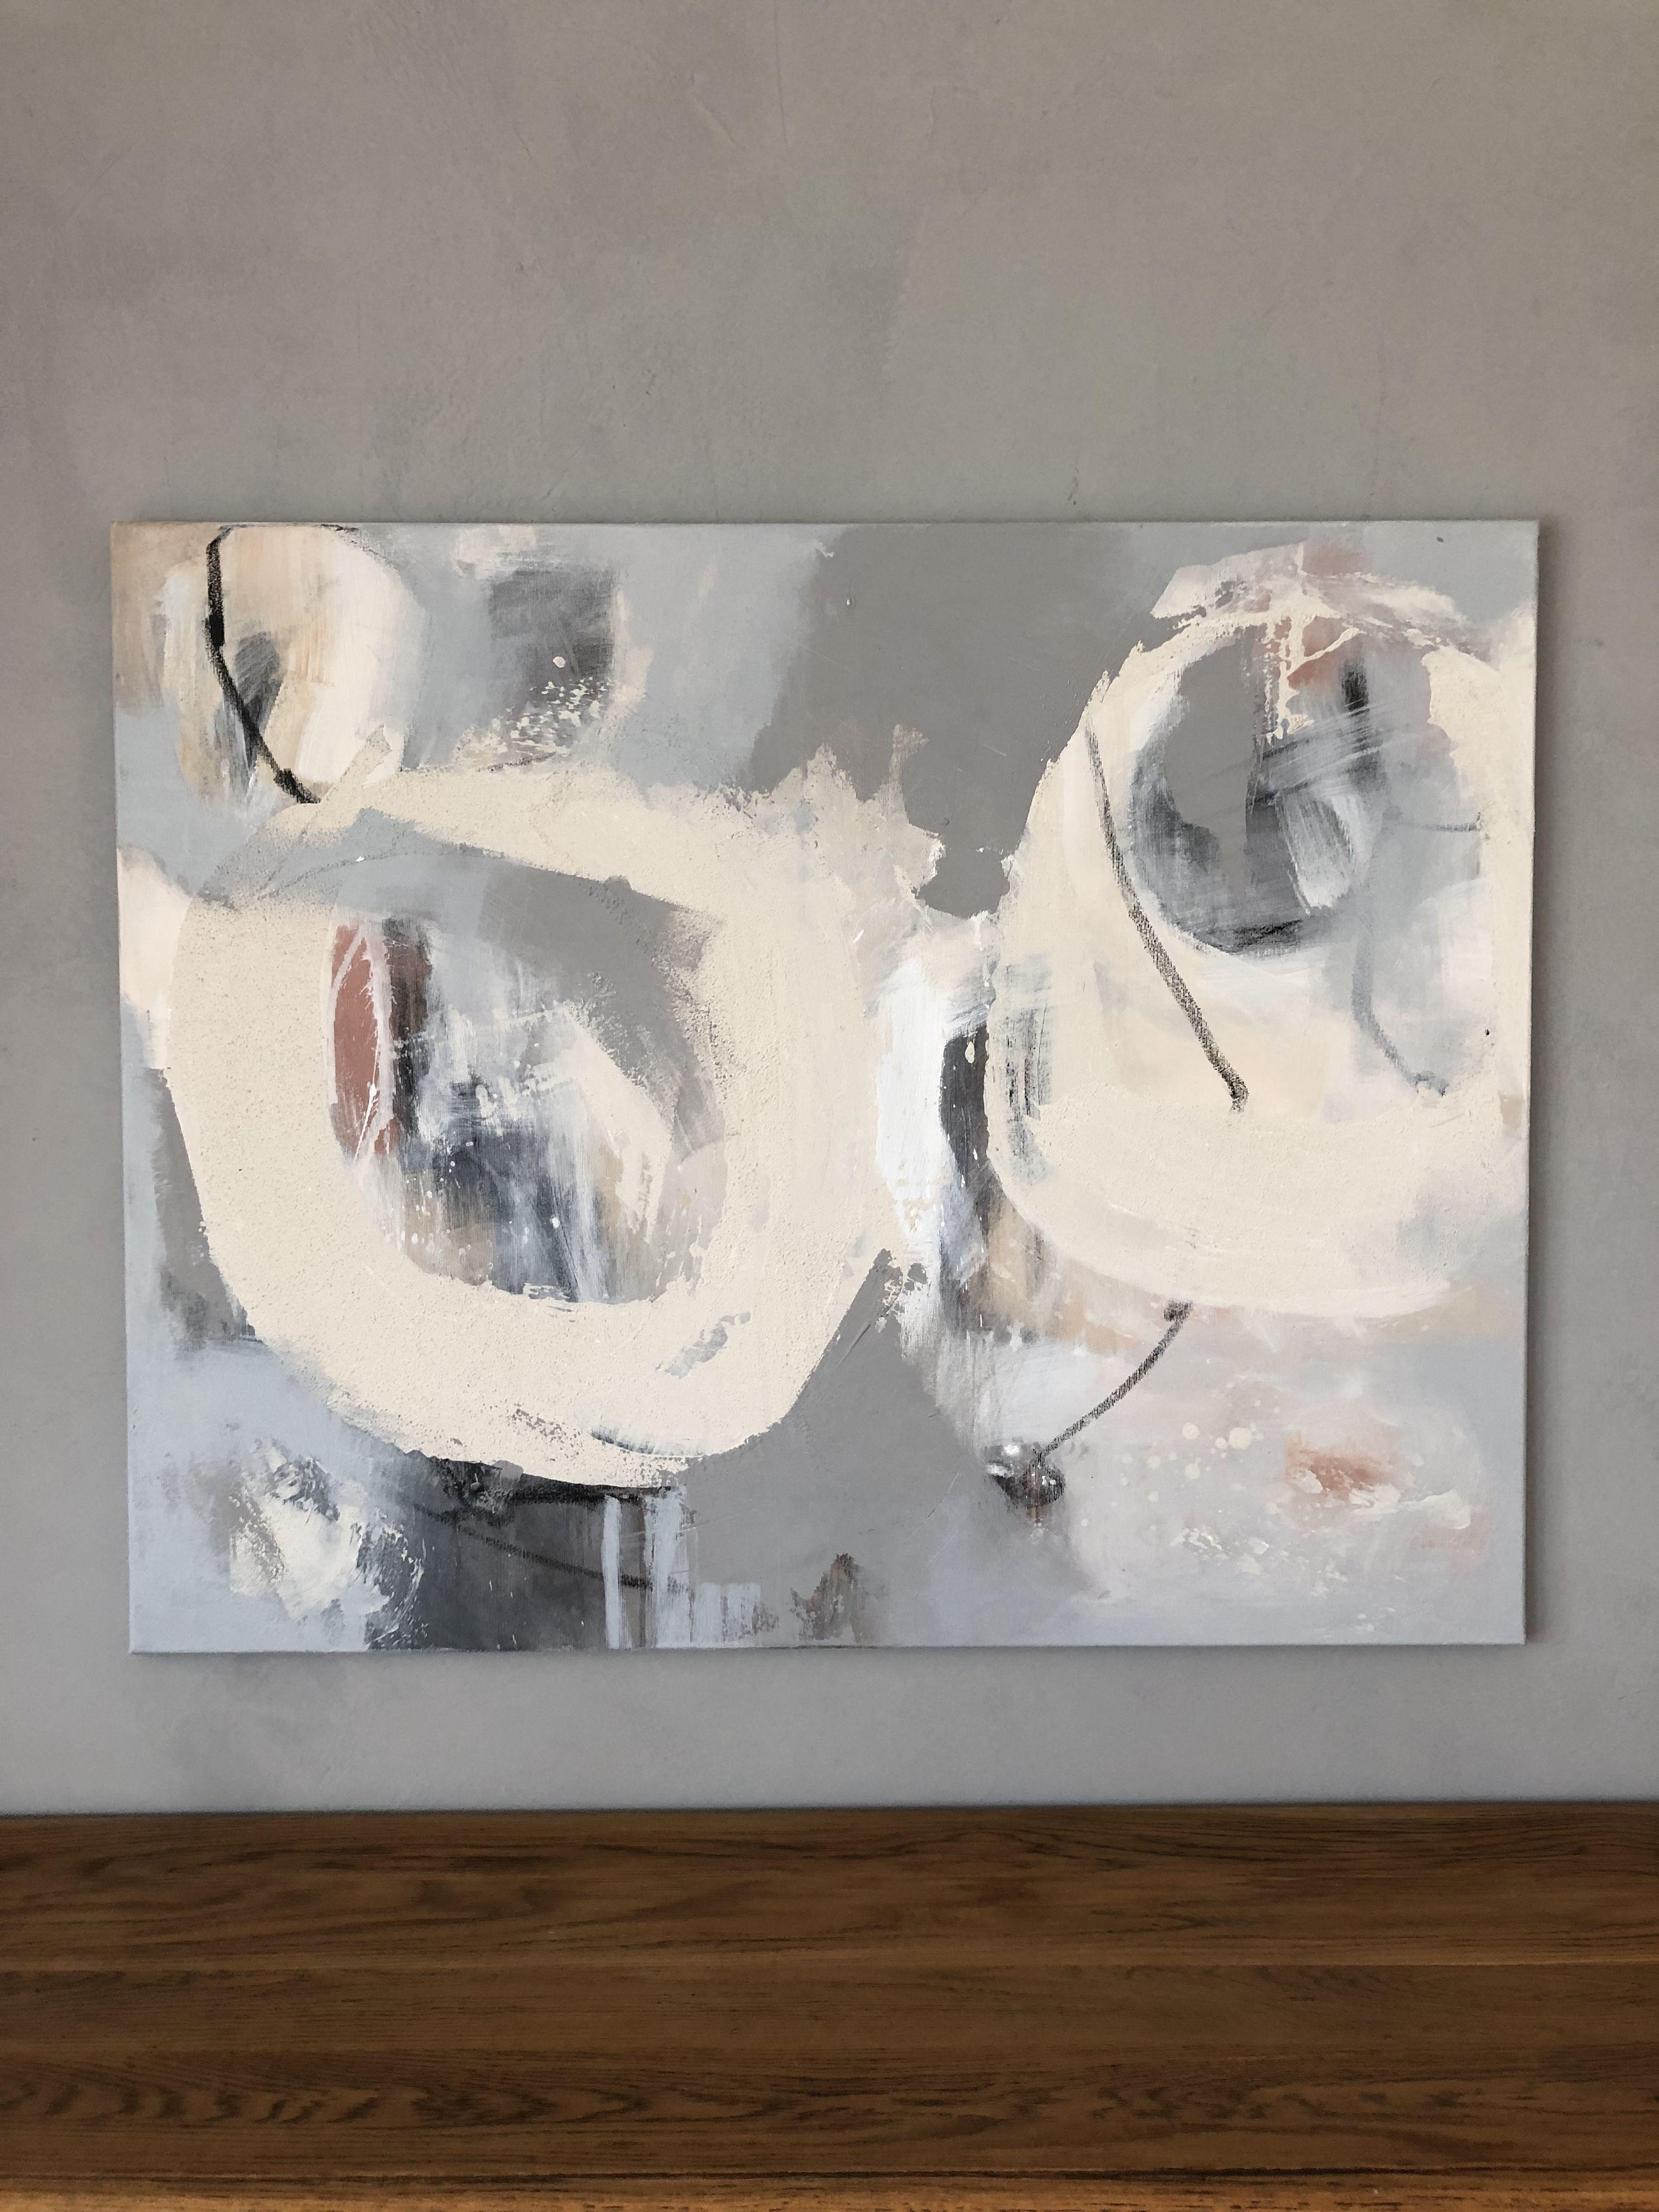 Der Augenblick 80x100cm Abstract Acryl Leinwand Gips